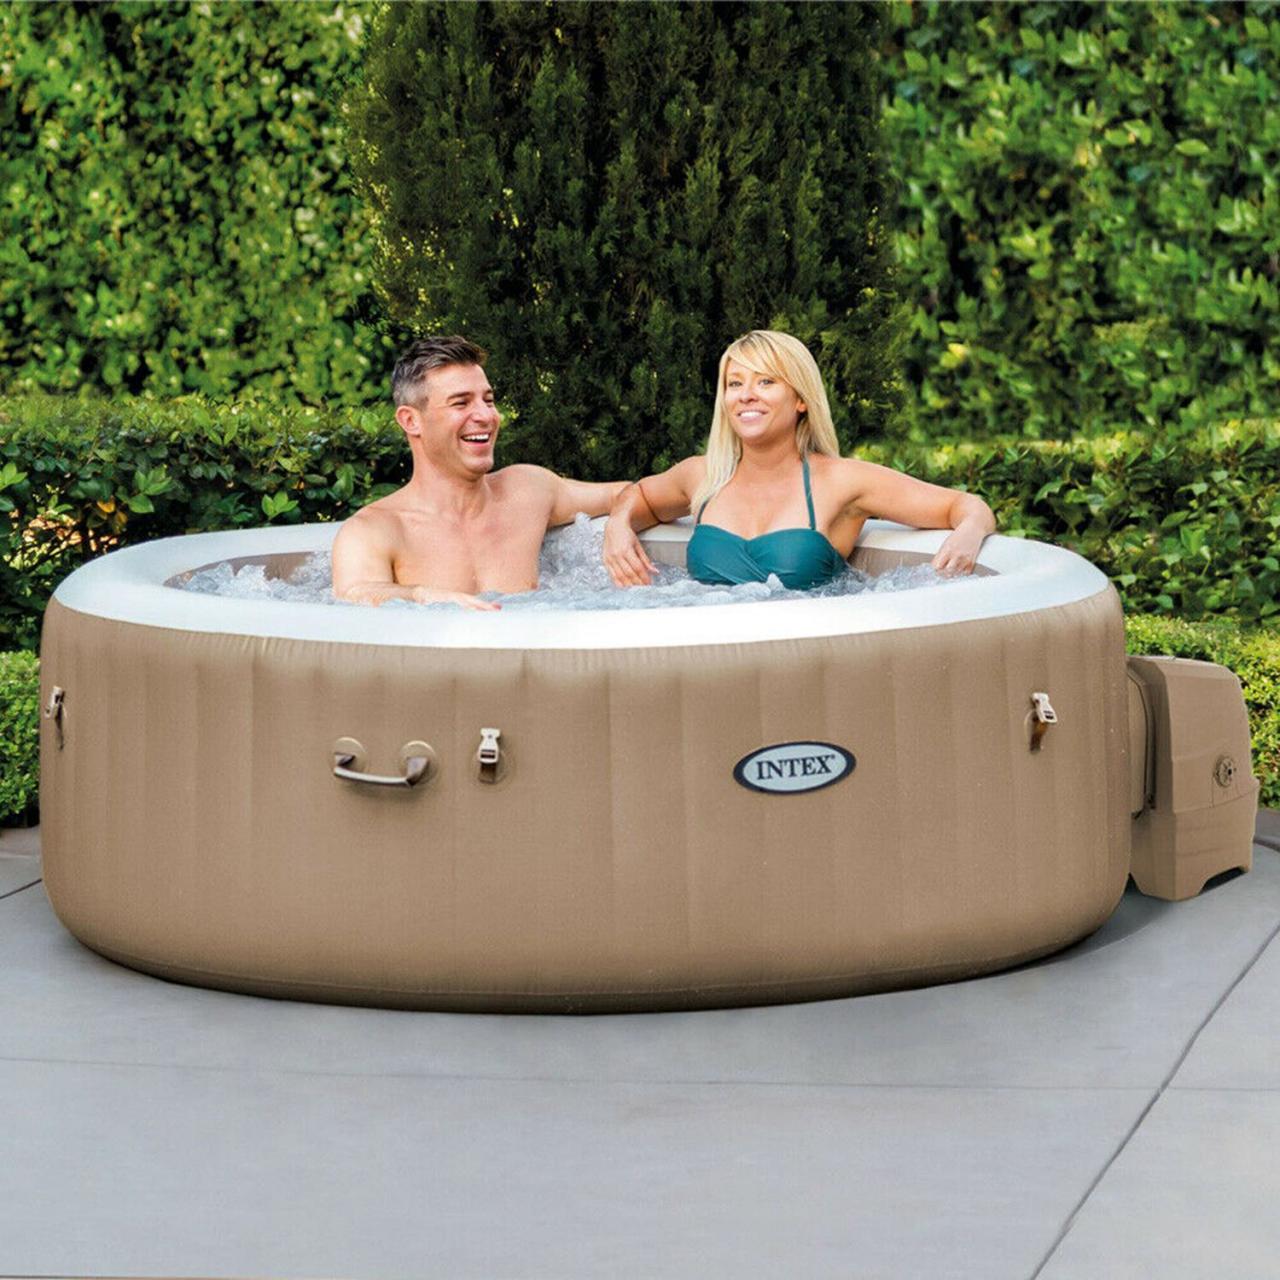 Intex 28426 Whirlpool Pure SPA Bubble Massage 196x71 cm aufblasbar 4 Personen